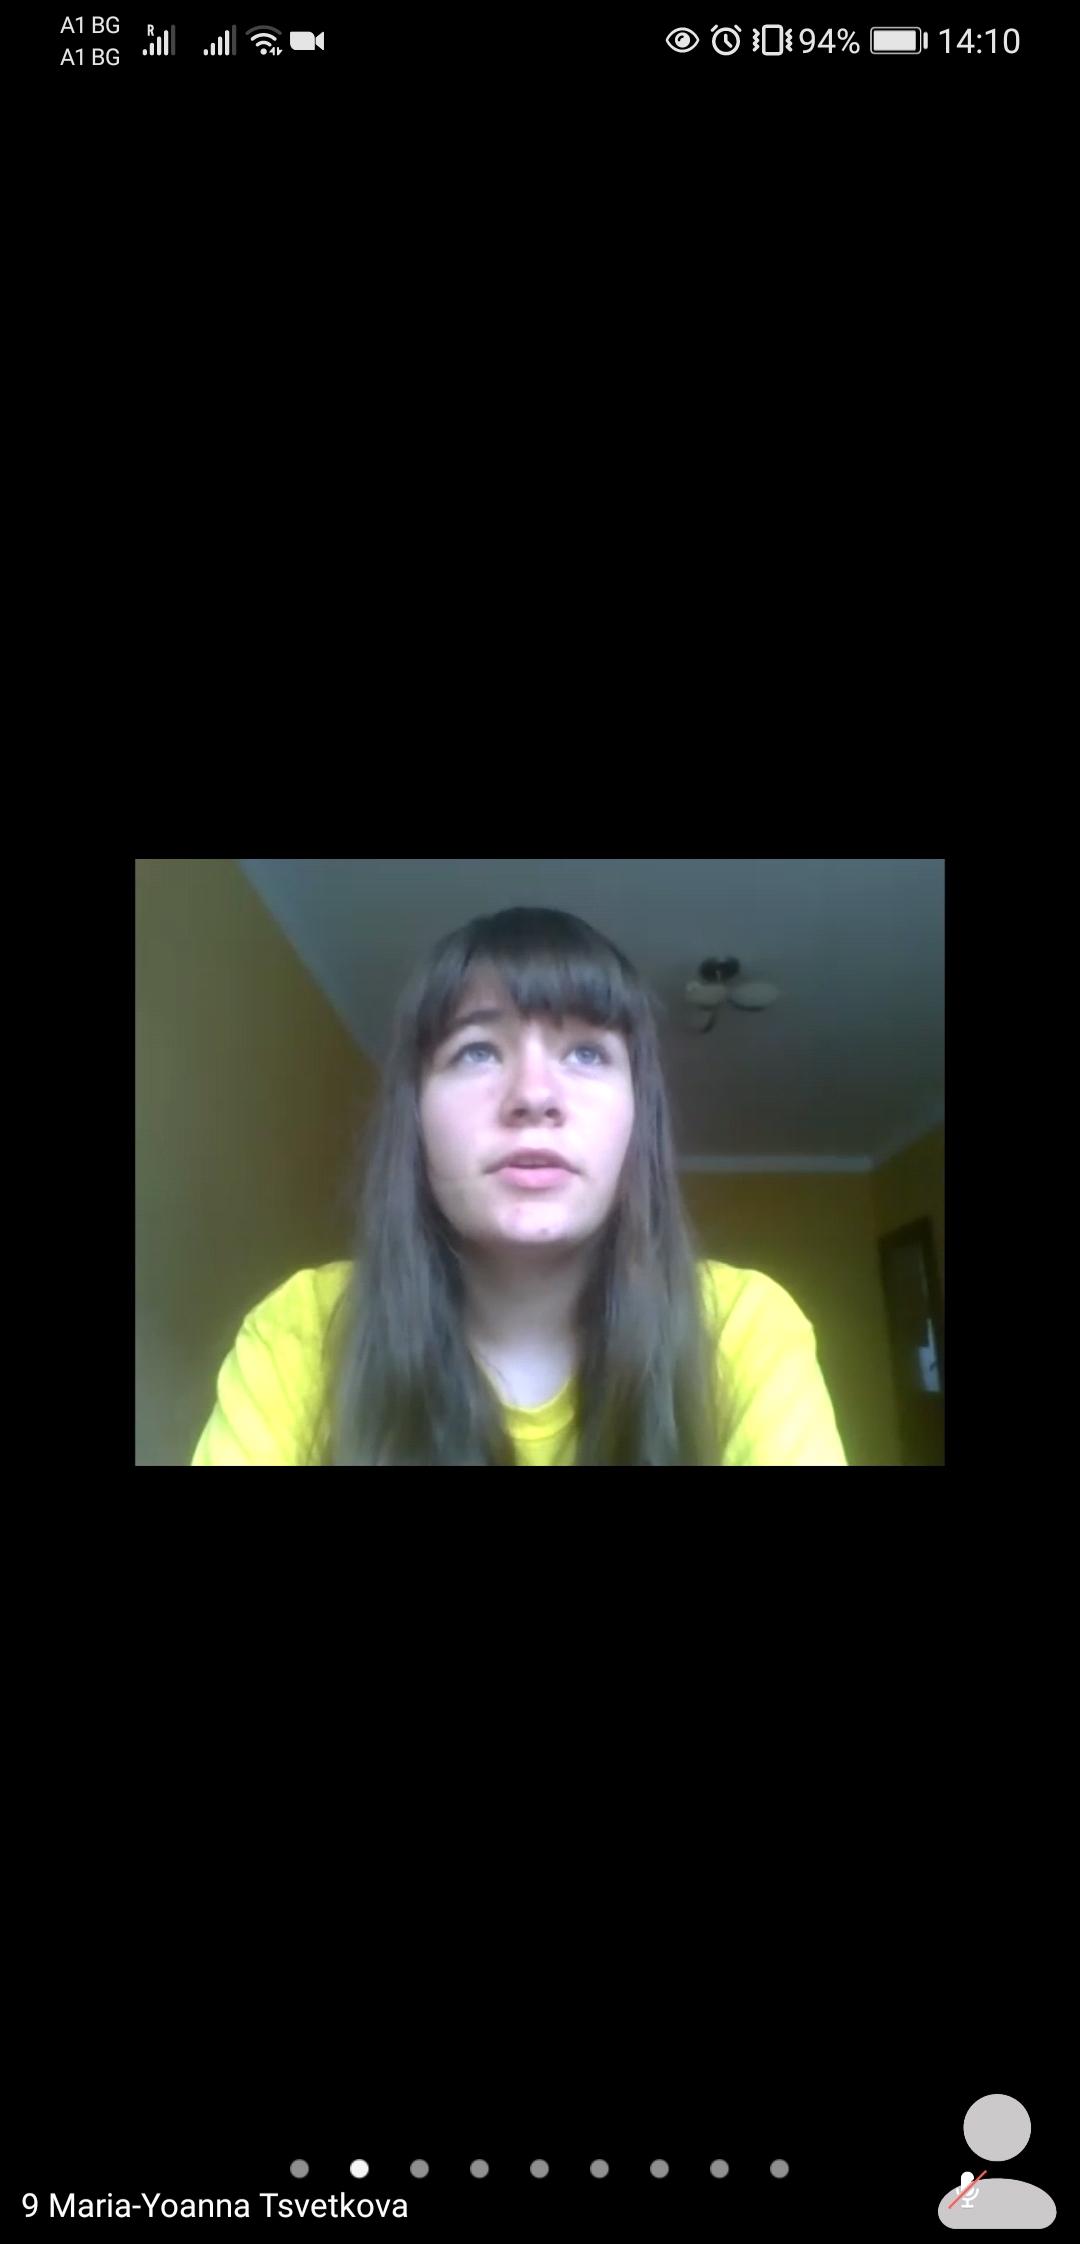 Мария-Йоана-Цветкова-7-клас-от-СУ-Христо-Ботев-Горна-Малина